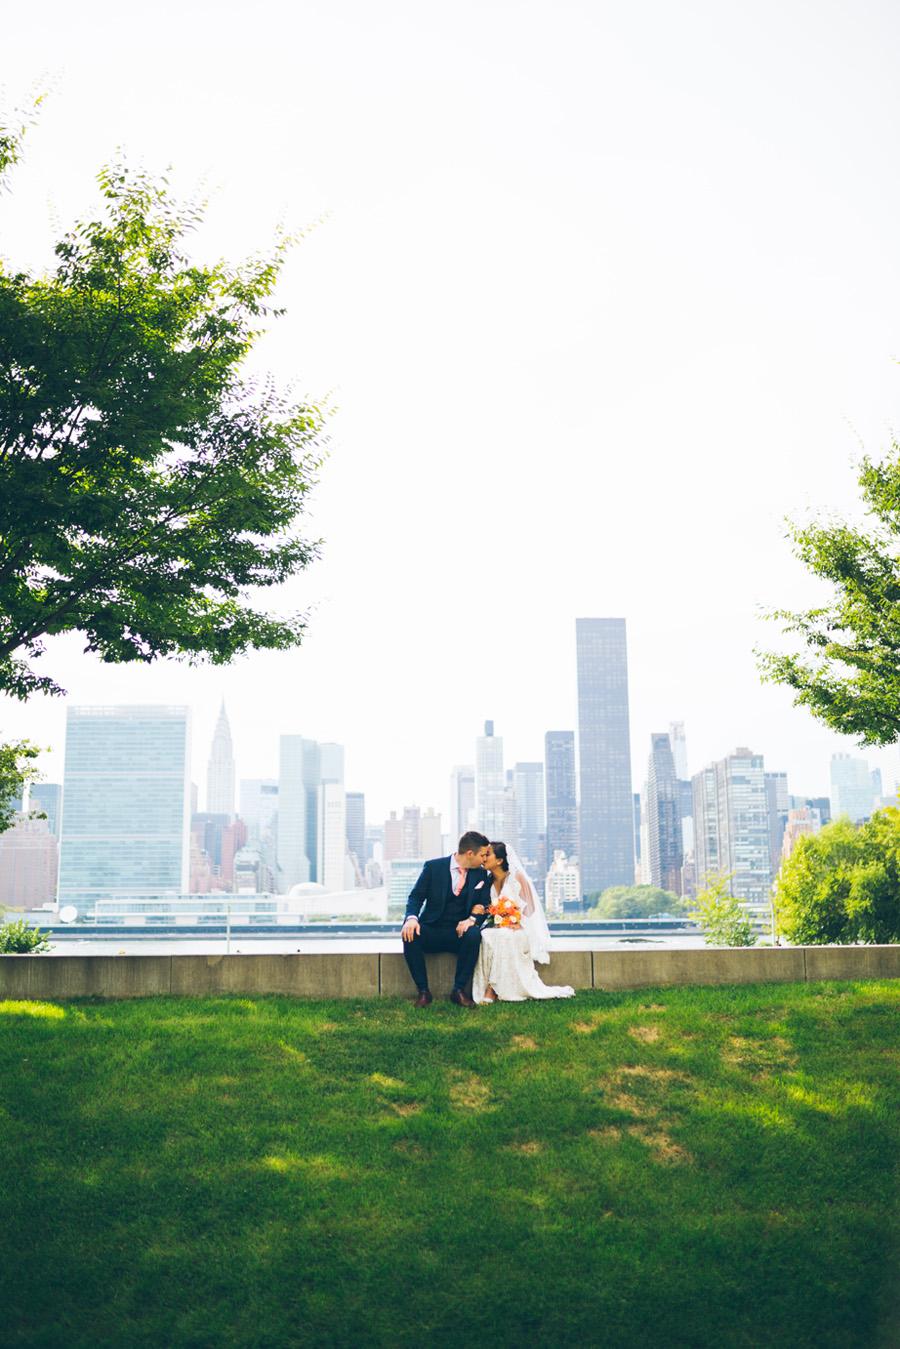 POOH-PETER-NYC-WEDDING-BRIDEGROOM-CYNTHIACHUNG-0440.jpg